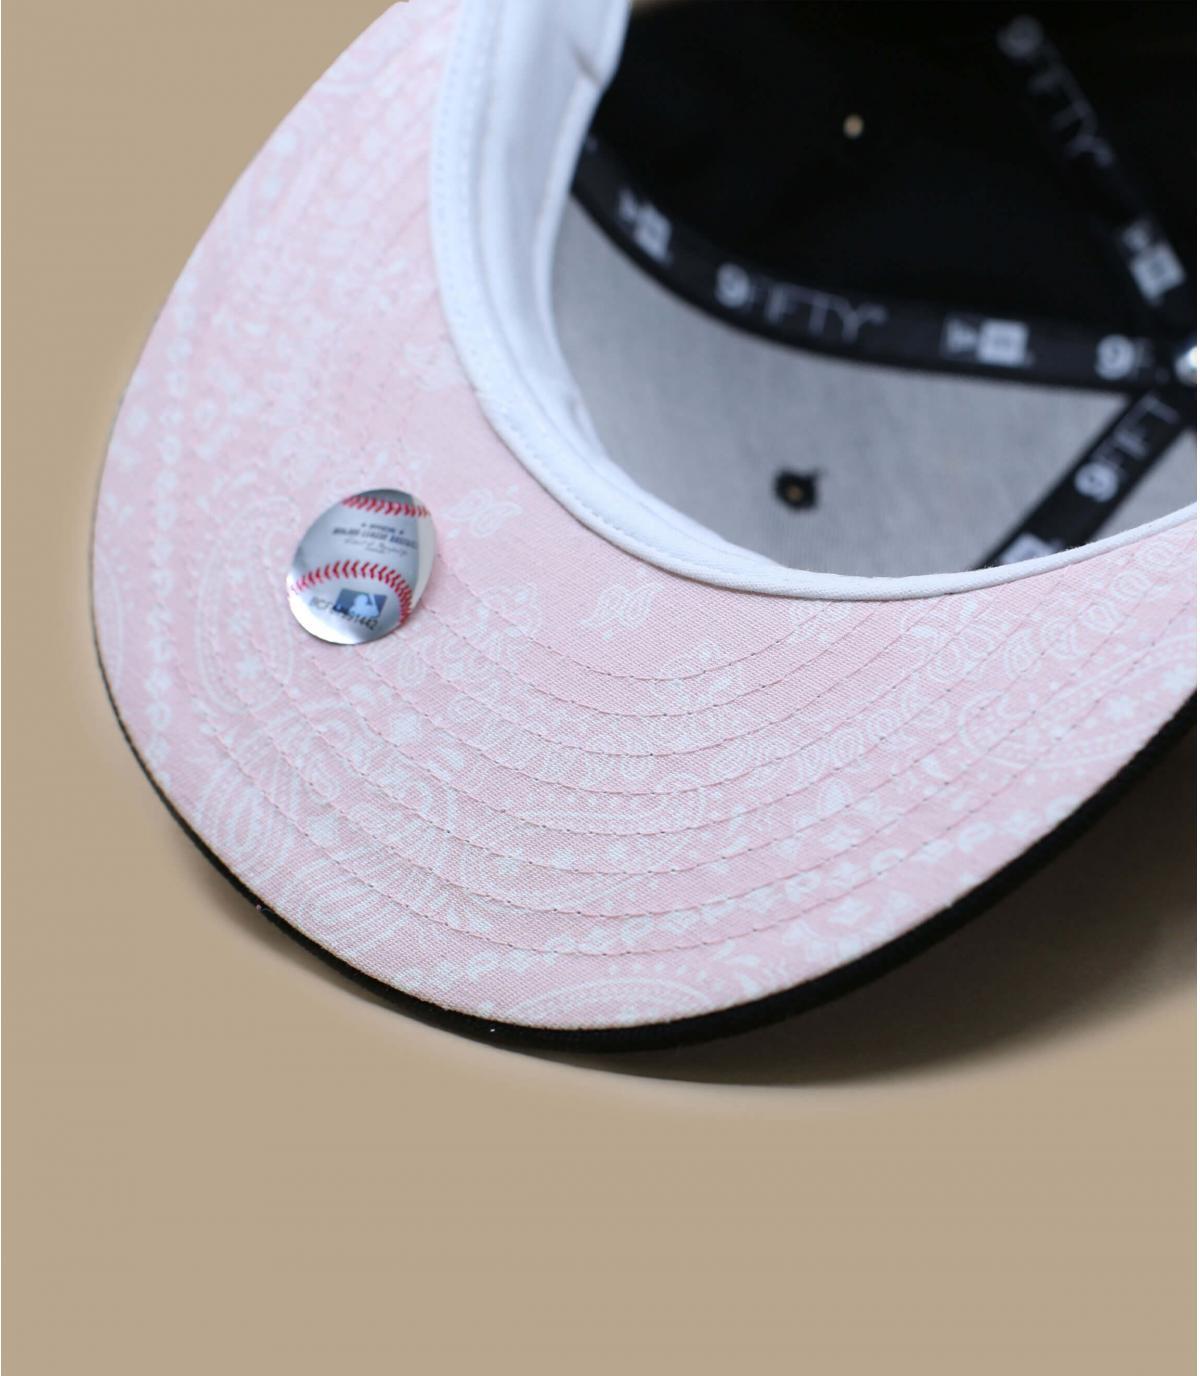 Détails Snapback Quickturn Paisley NY 950 black pink - image 5